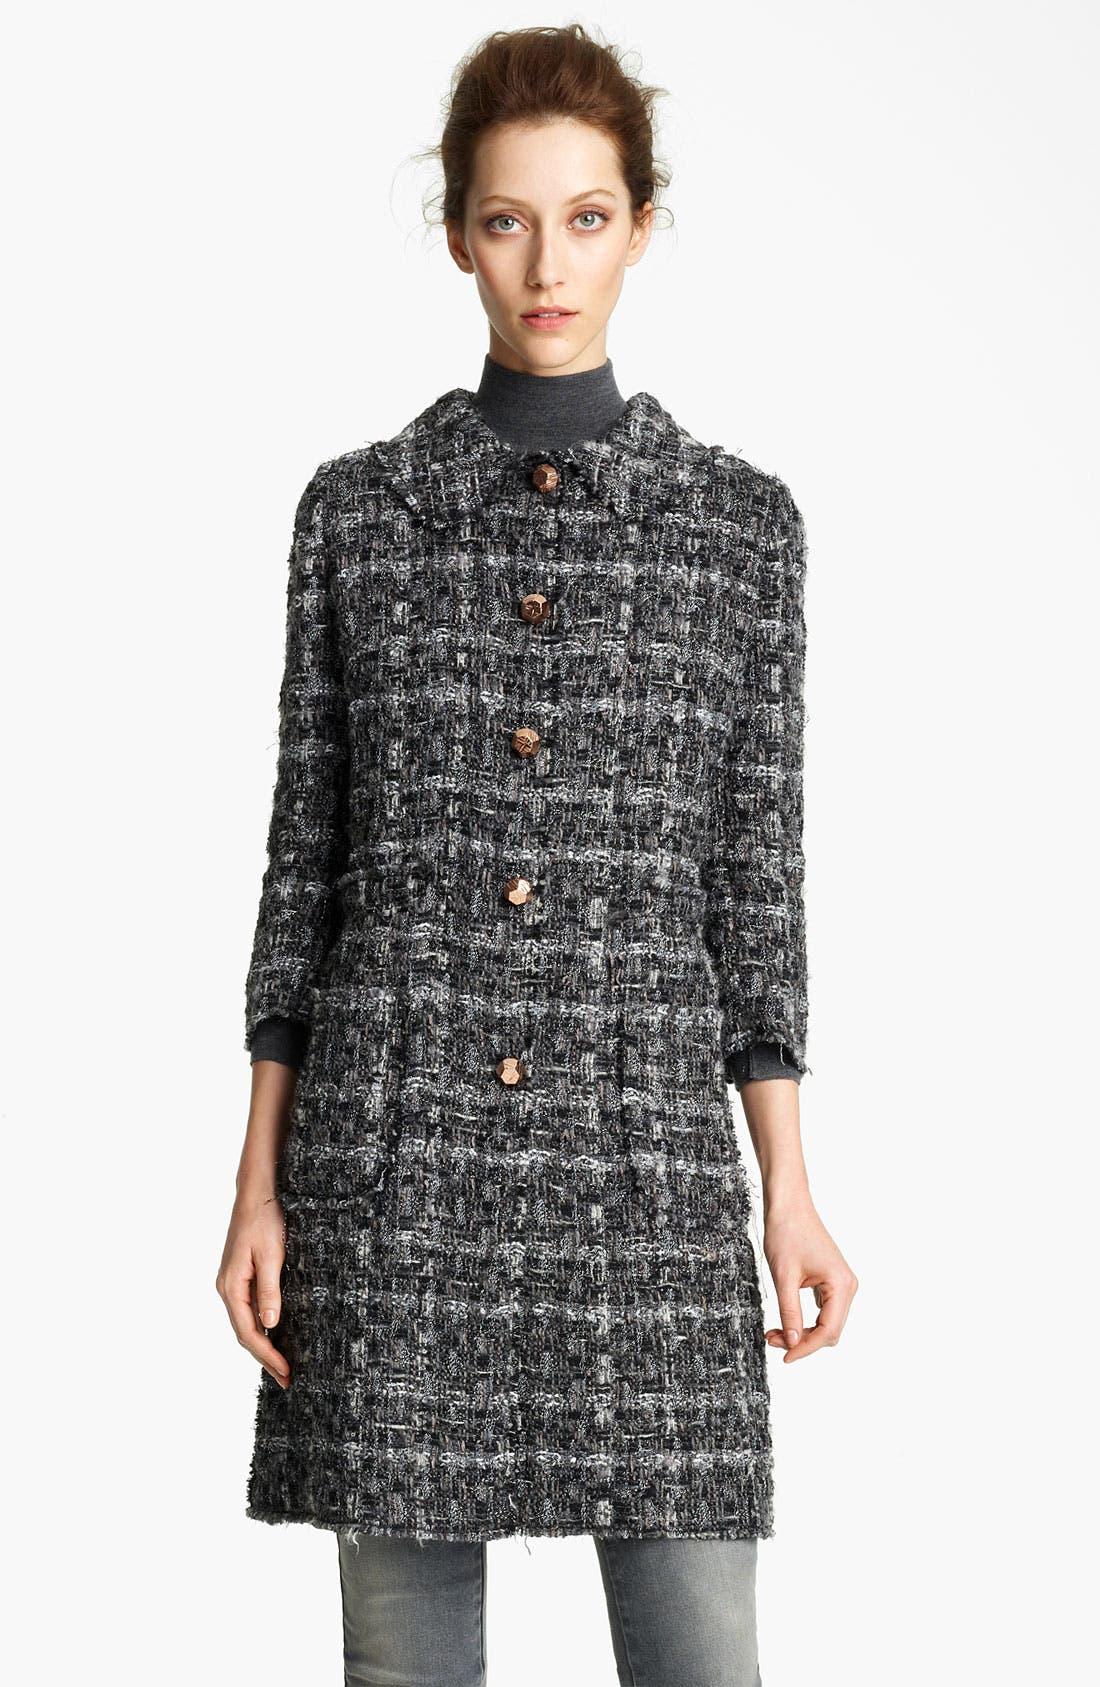 Alternate Image 1 Selected - Dolce&Gabbana Metallic Button Tweed Coat